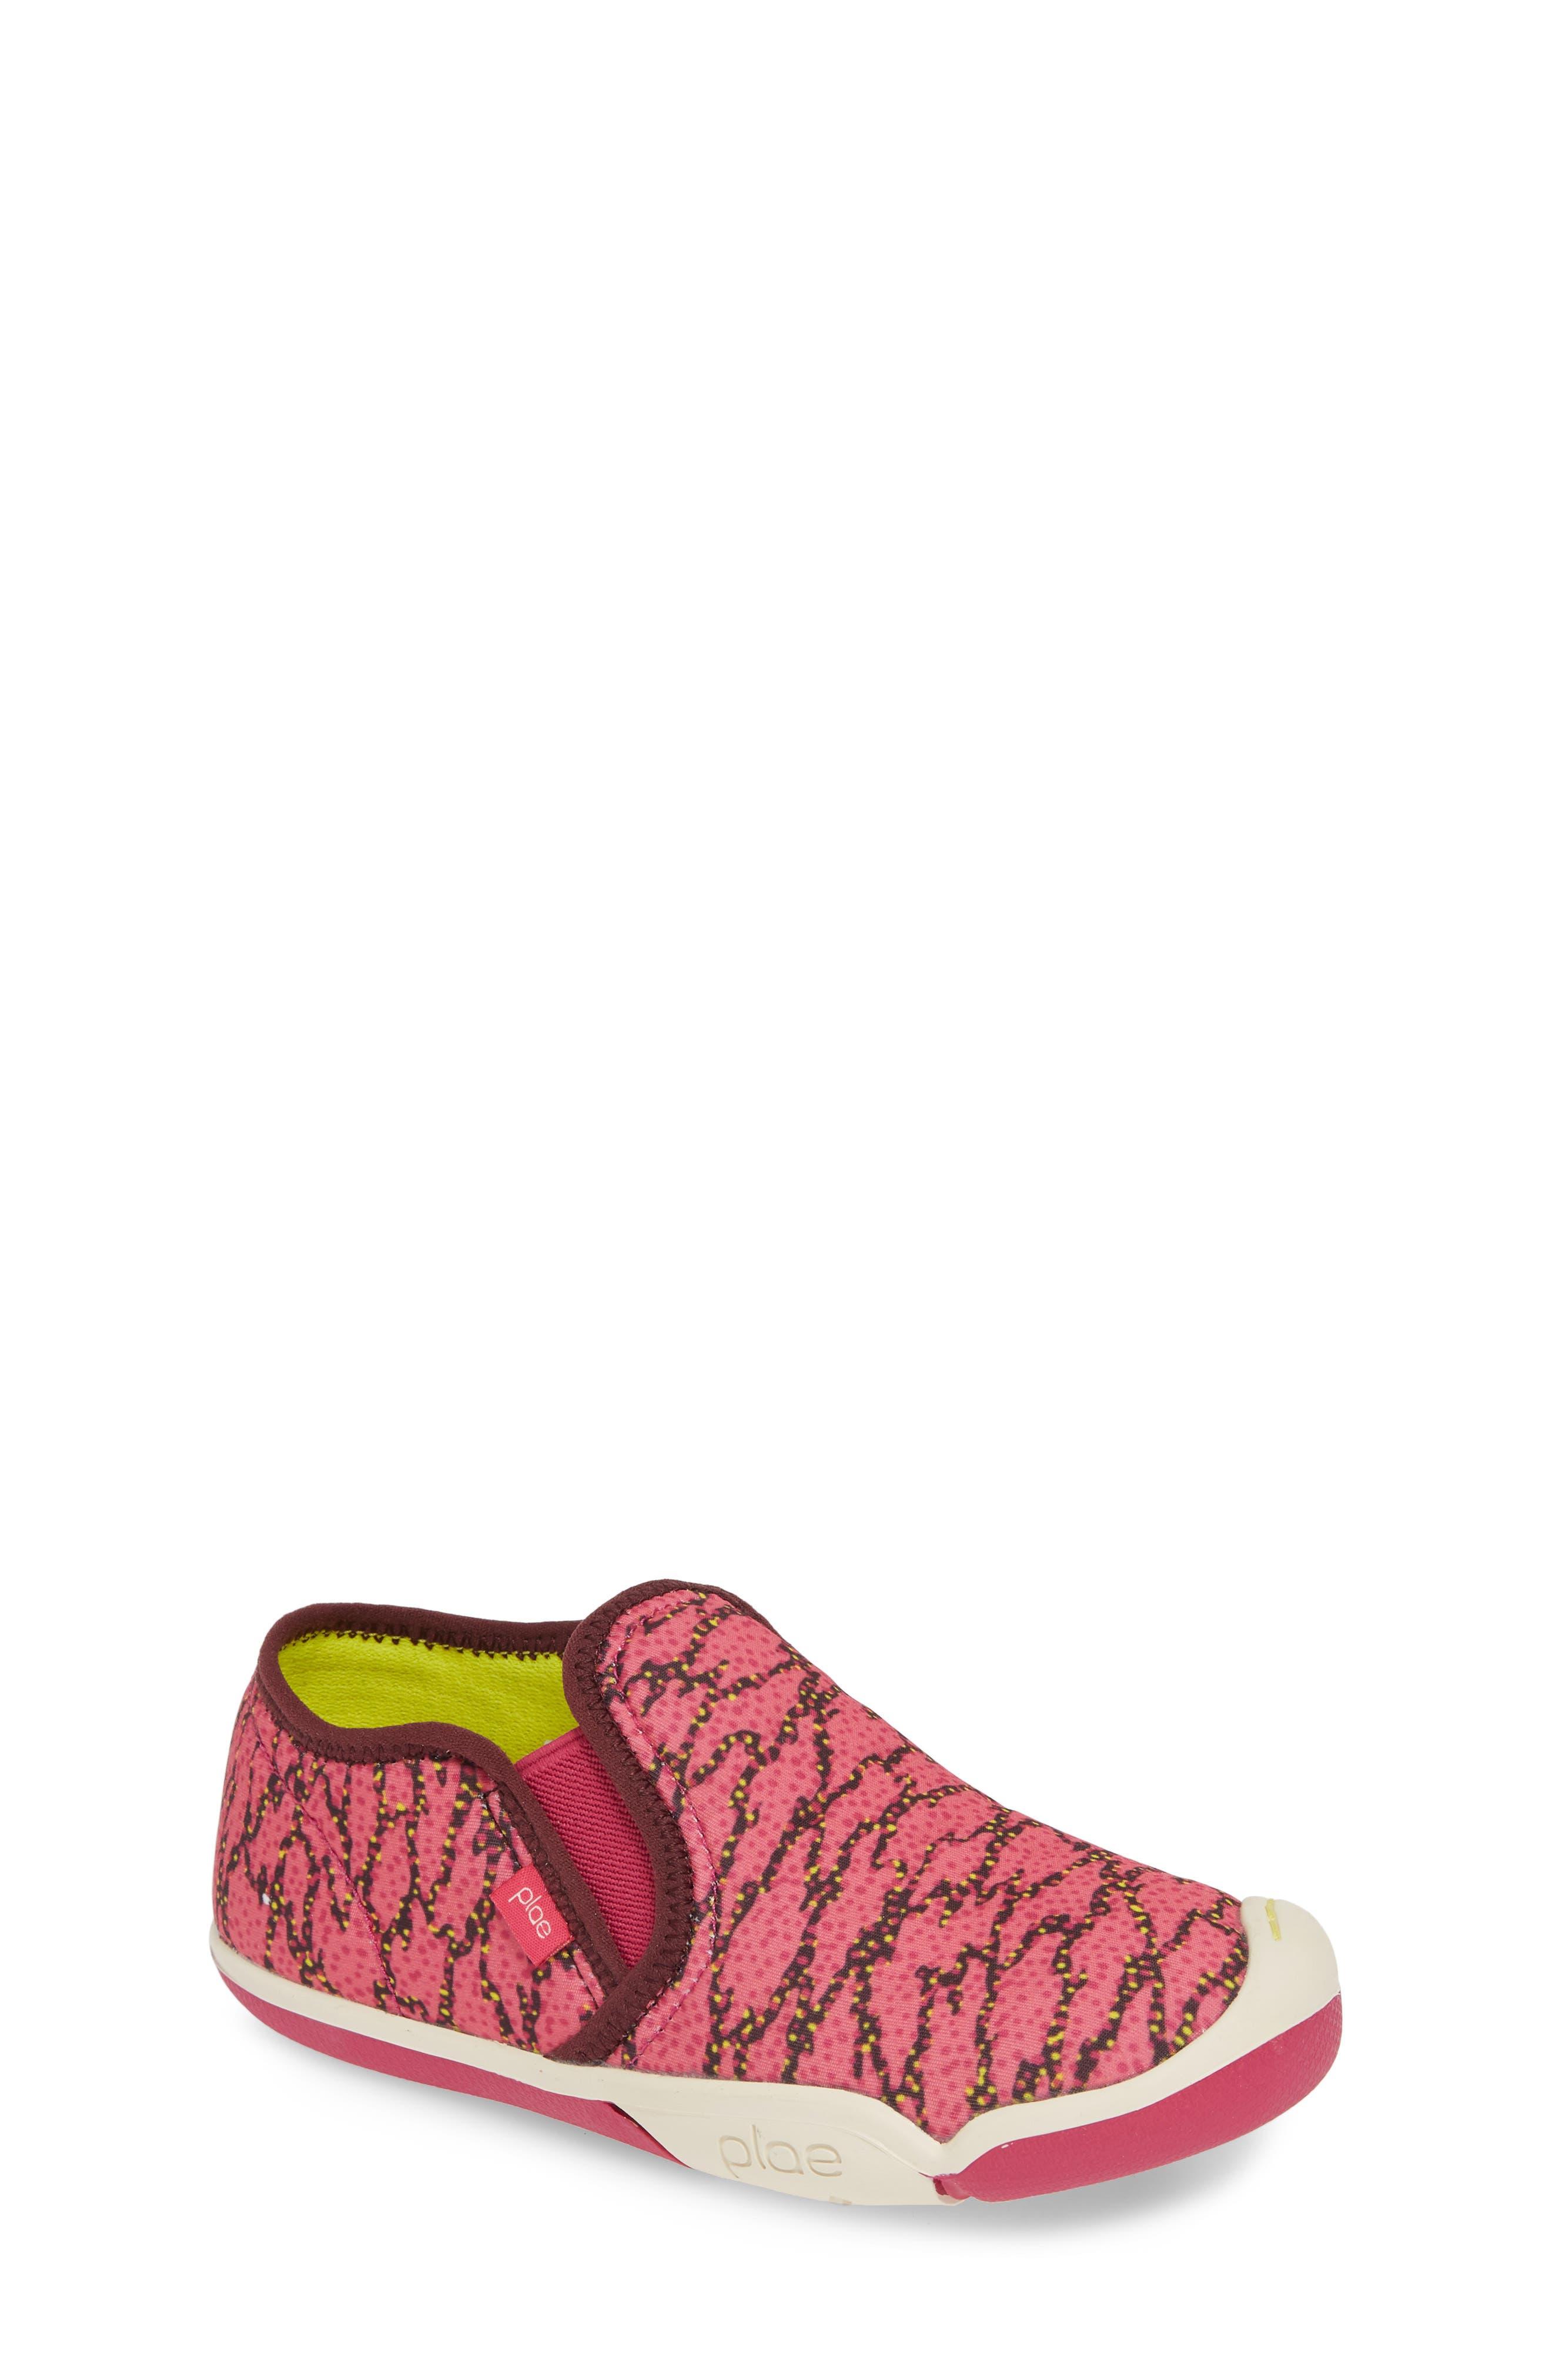 PLAE Migi Slip-On Sneaker, Main, color, ELECTRIC FUCHSIA SURGE